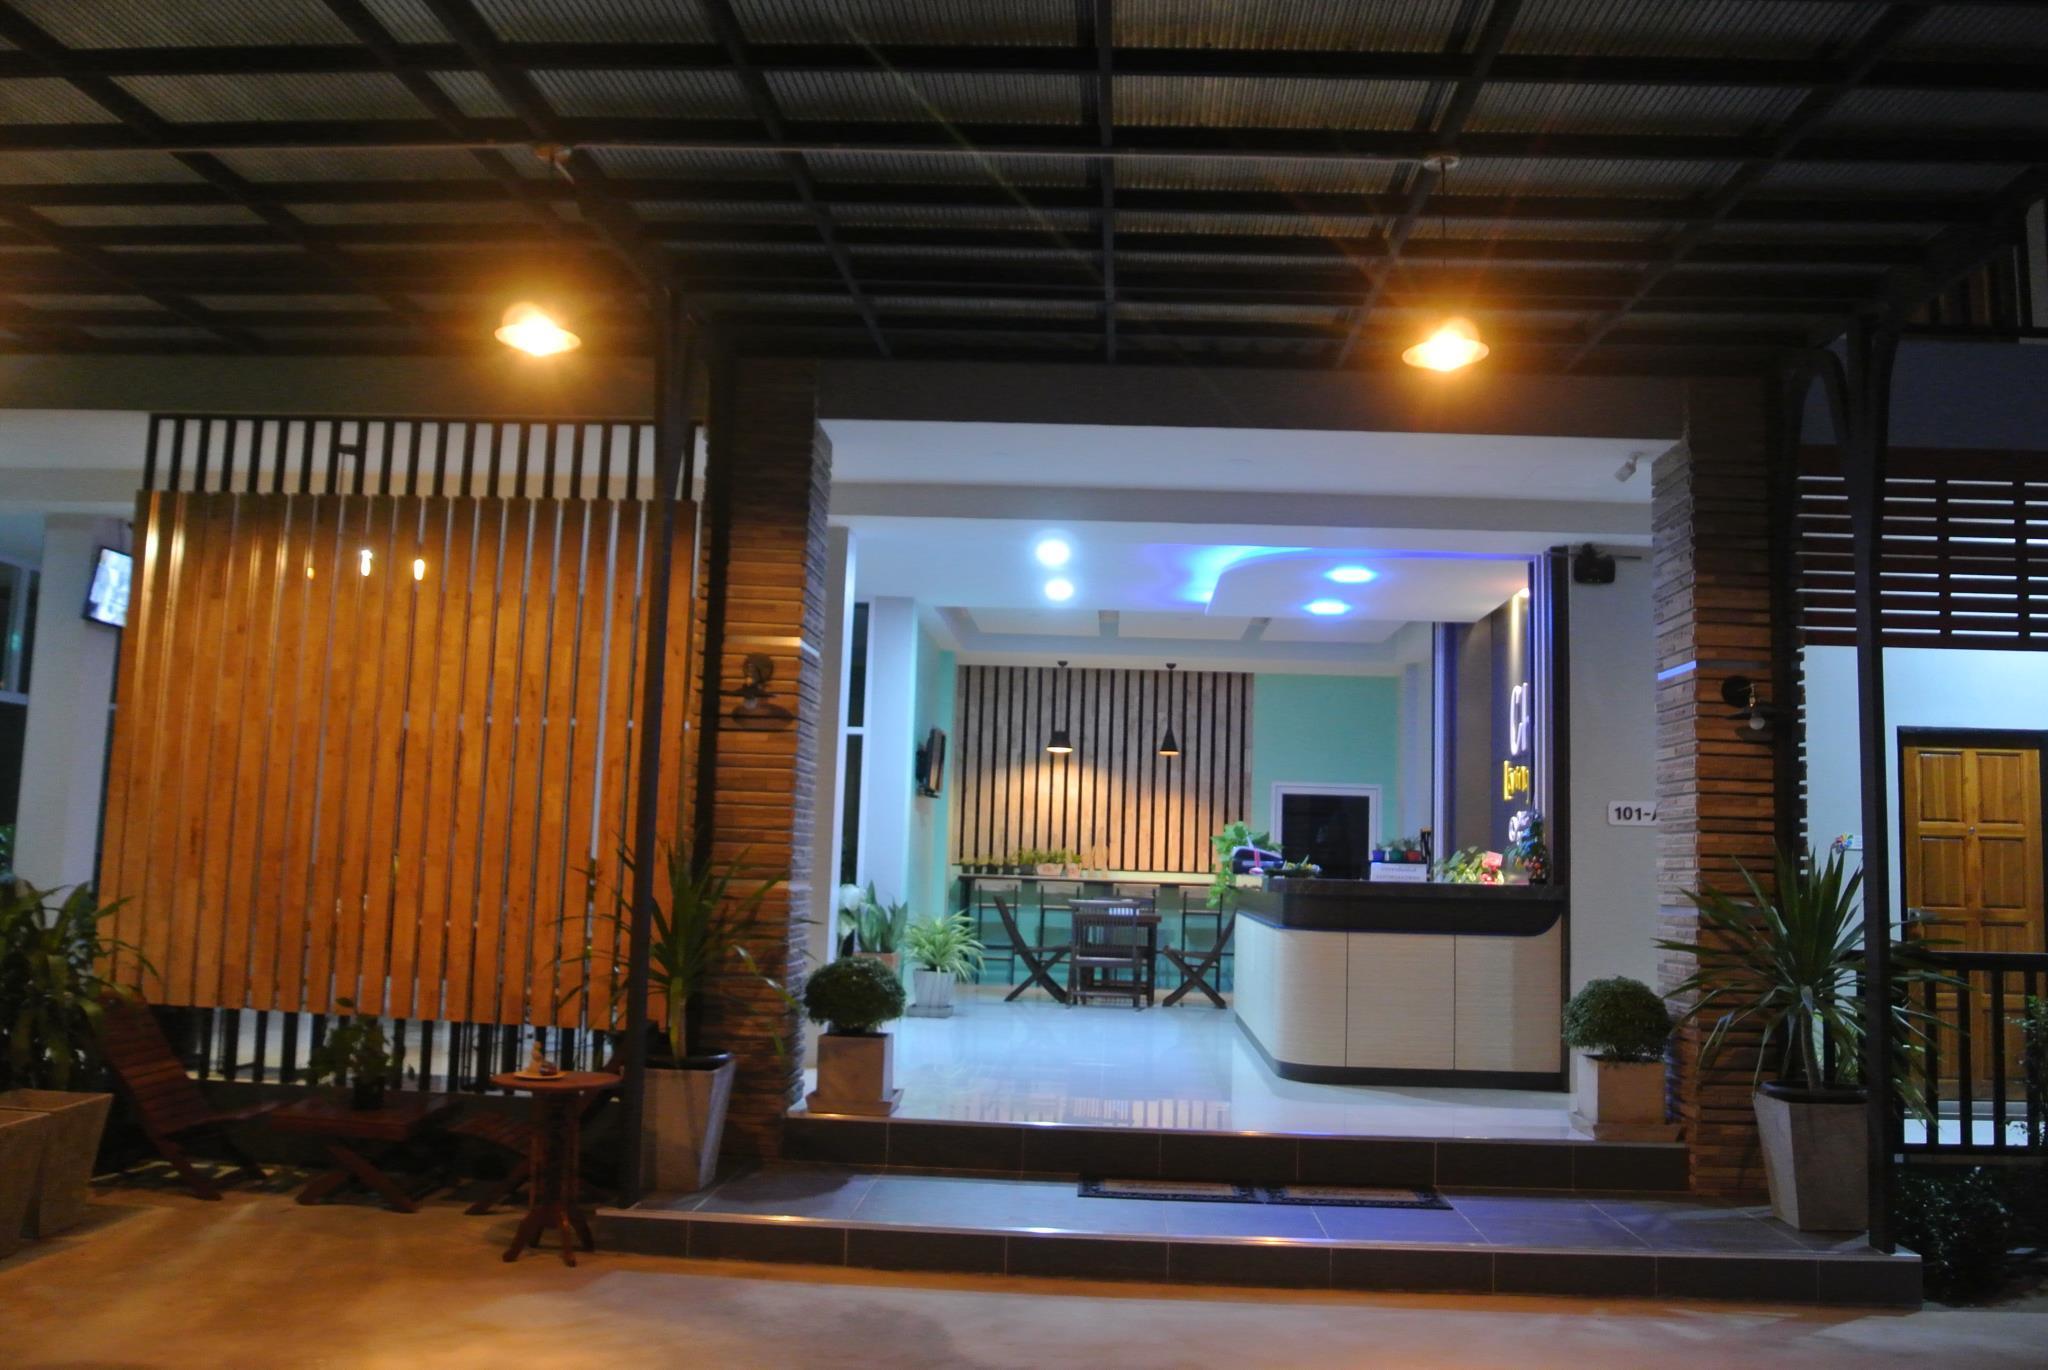 Price Chic Living Hotel